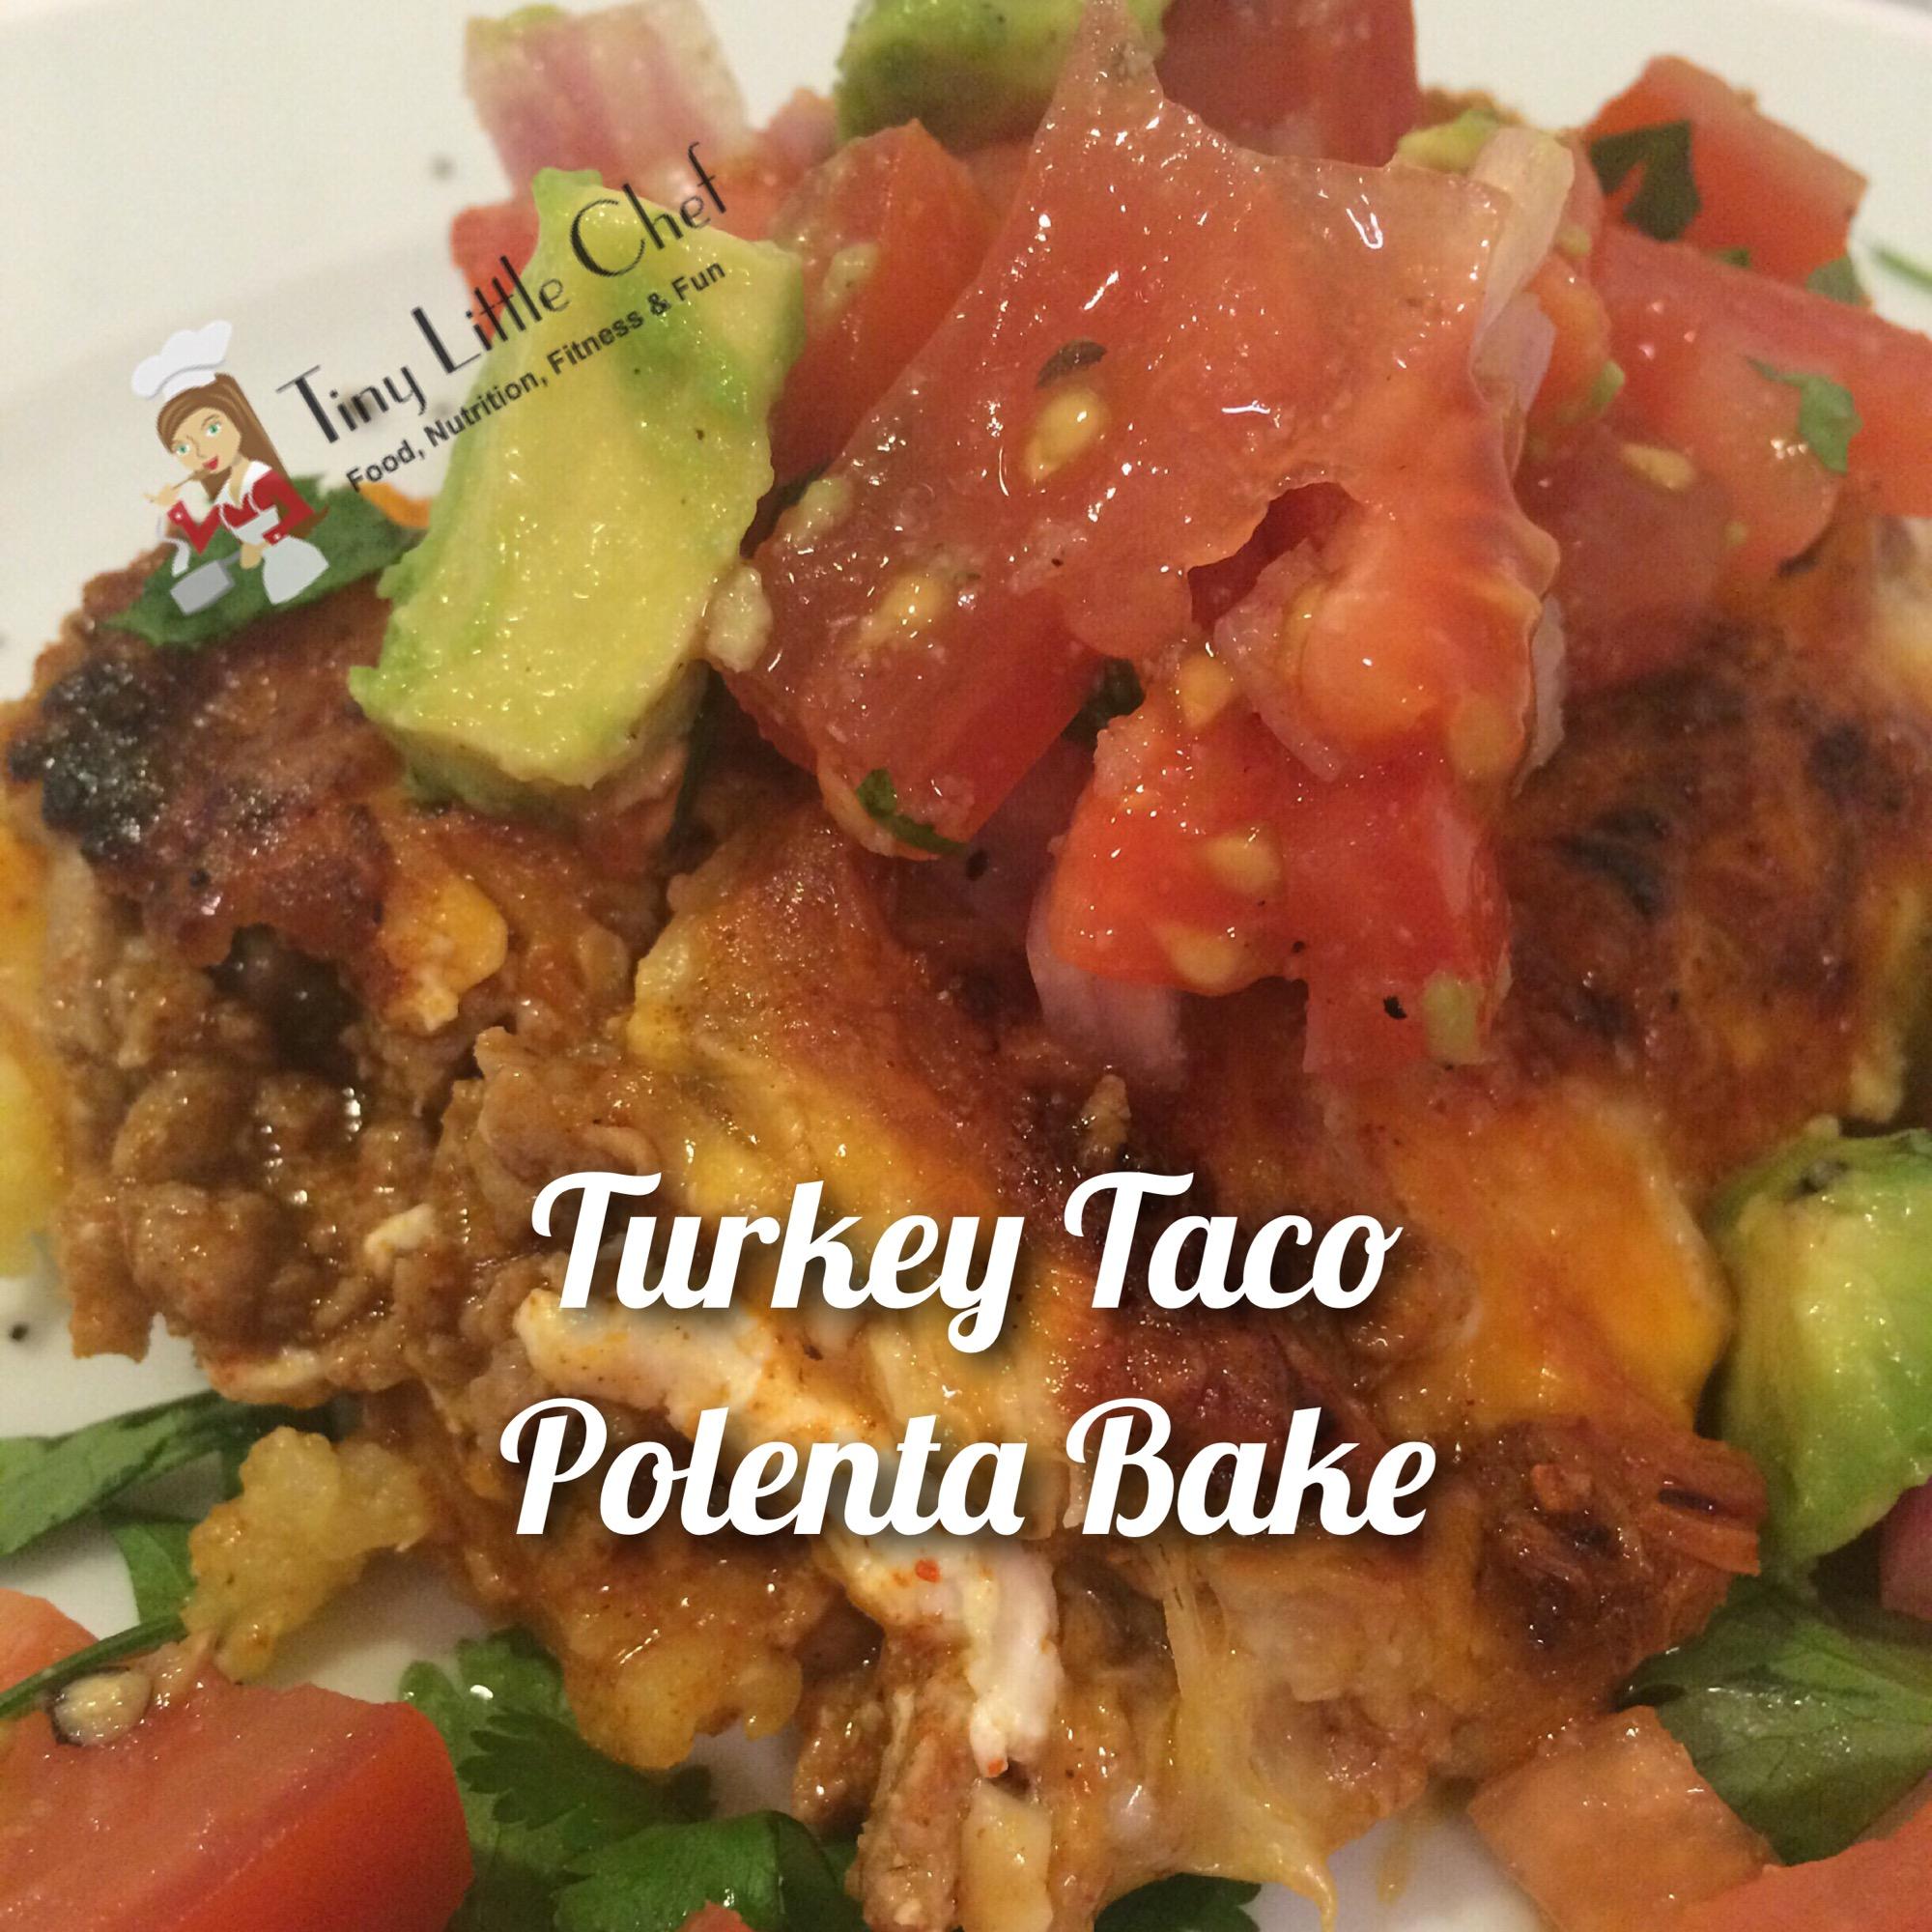 Tiny Little Chef Turkey Taco Polenta Bake